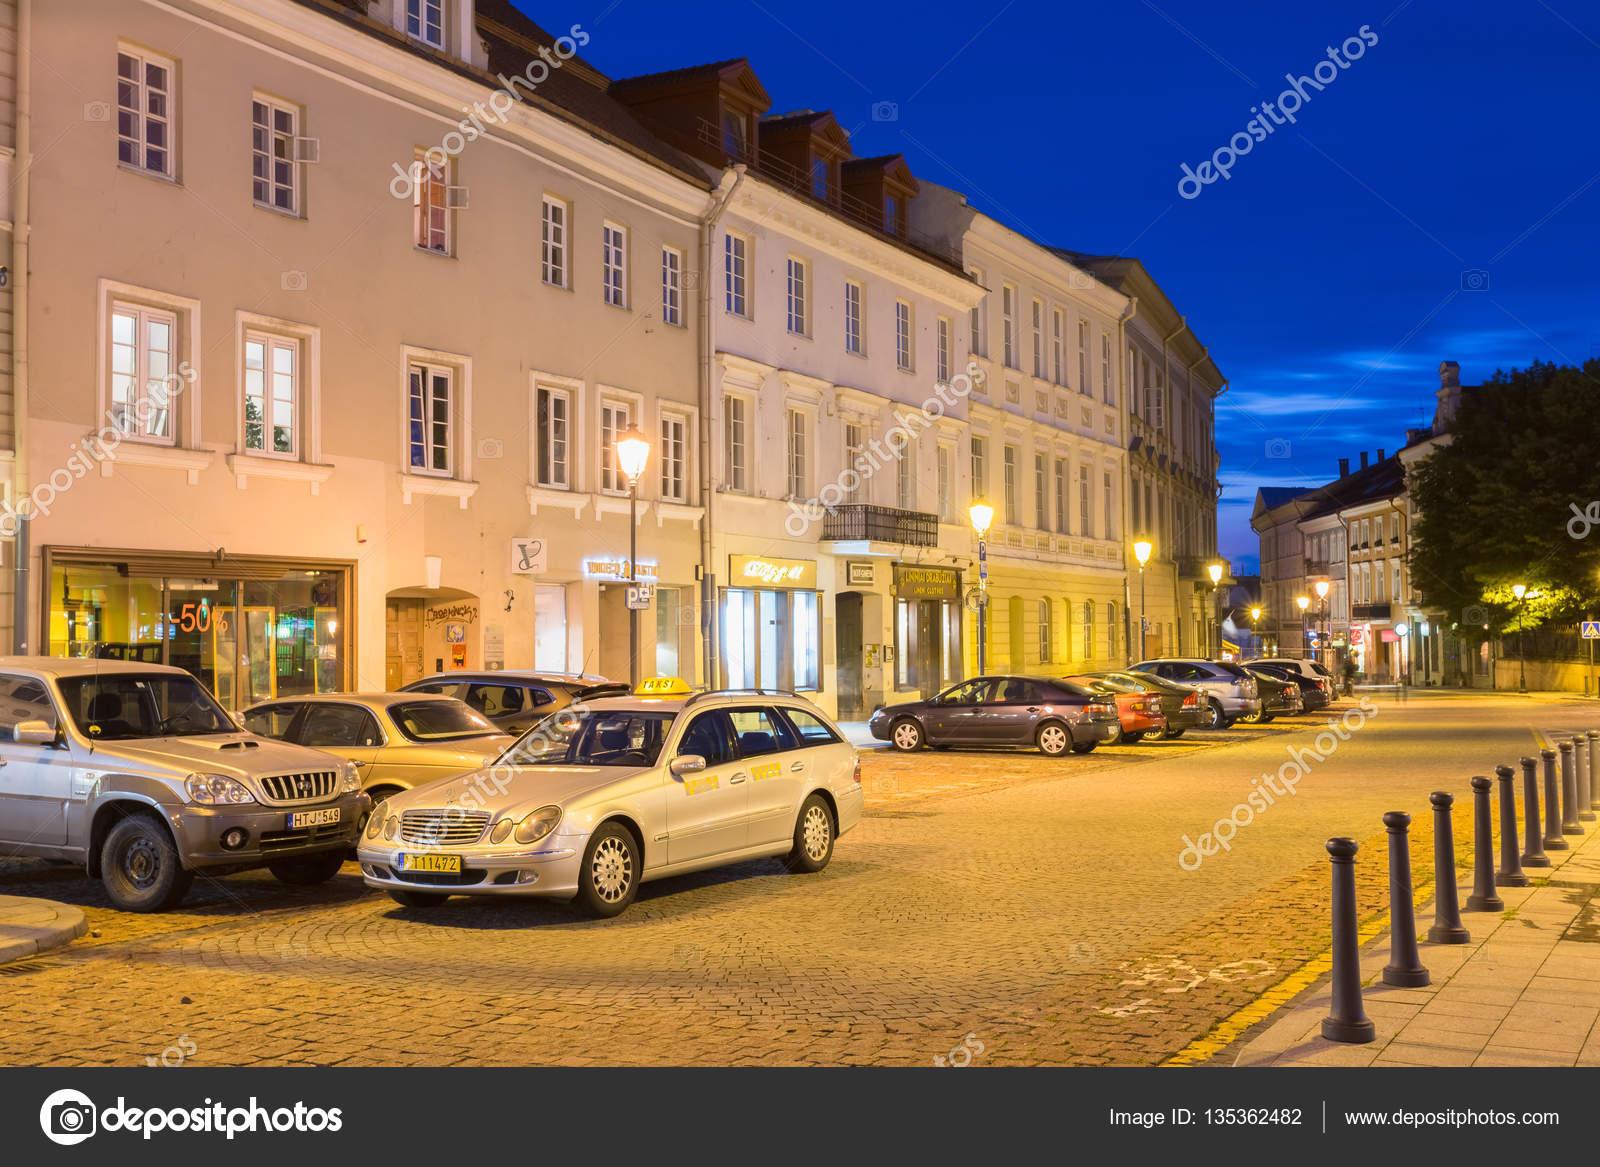 f2a884c5ce9 Βίλνιους Λιθουανίας ακίνητος ασημένια Mercedes Benz αυτοκινήτων ταξί στον  δρόμο– Εκδοτικές Φωτογραφίες Αρχείου